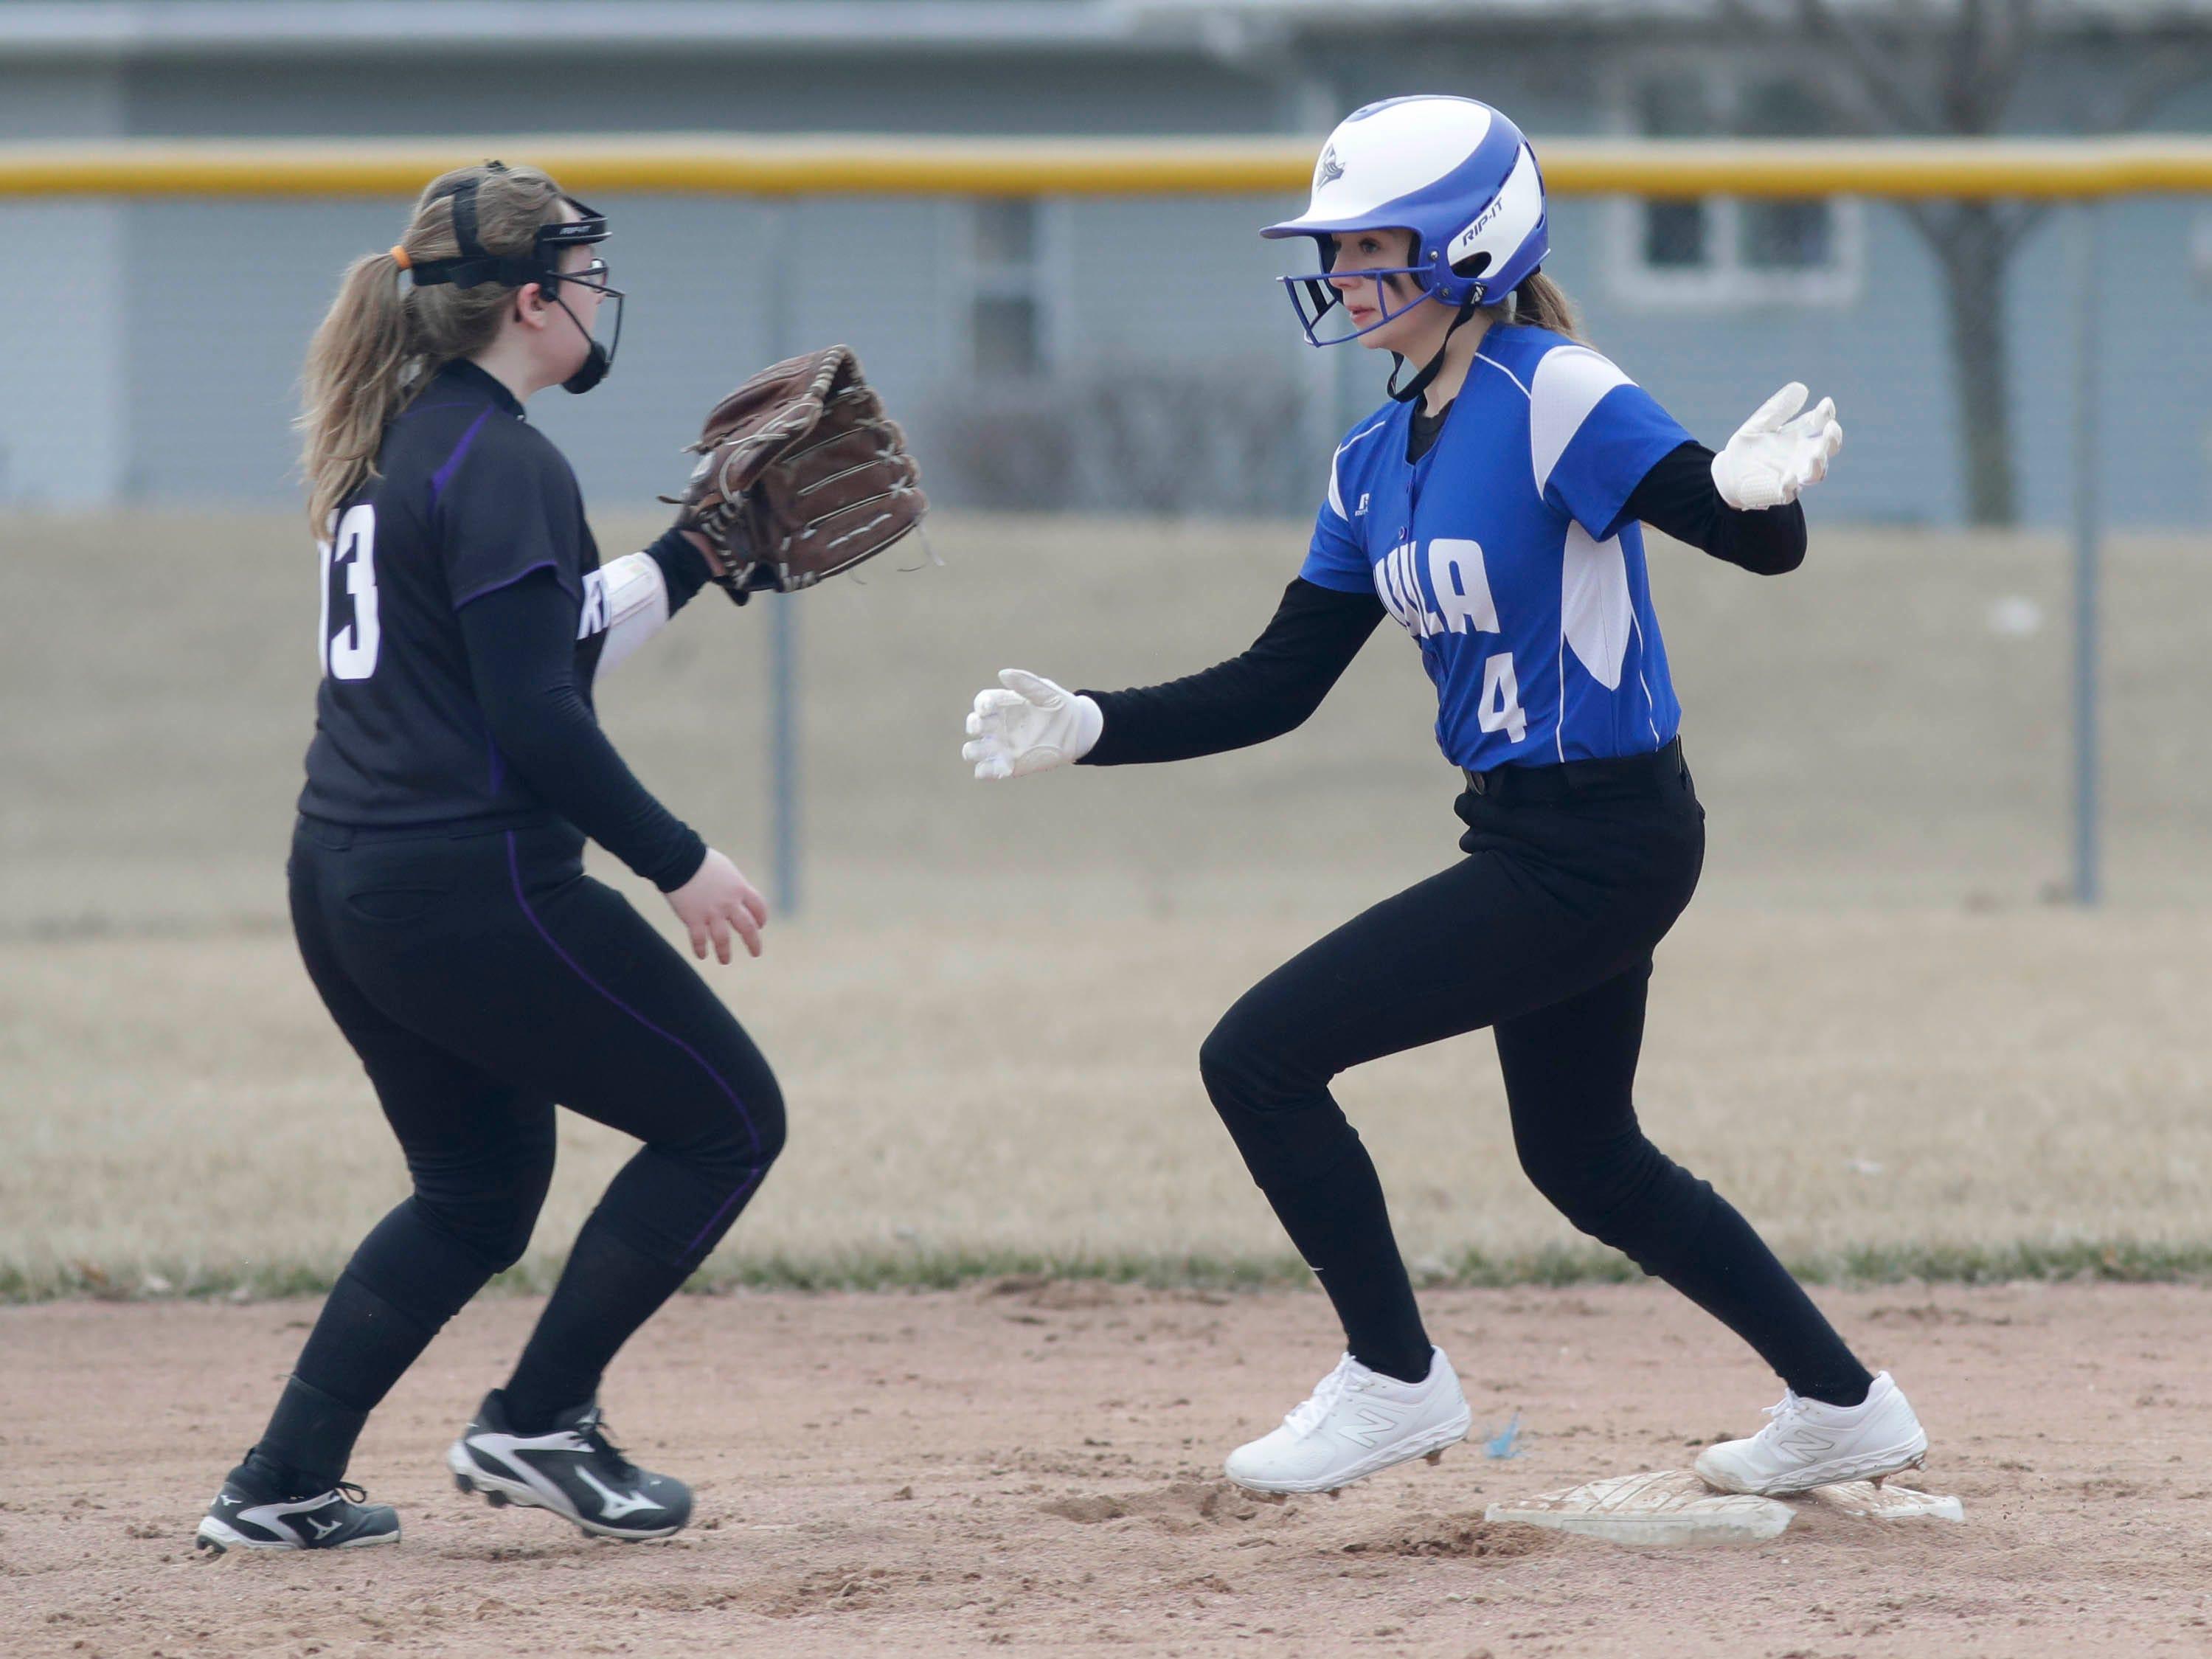 Winnebago Lutheran's Rylee Loehr (4) runs over second base by Kiel's Emily Suchan (13), Thursday, March 28, 2019, in Fond du Lac, Wis.